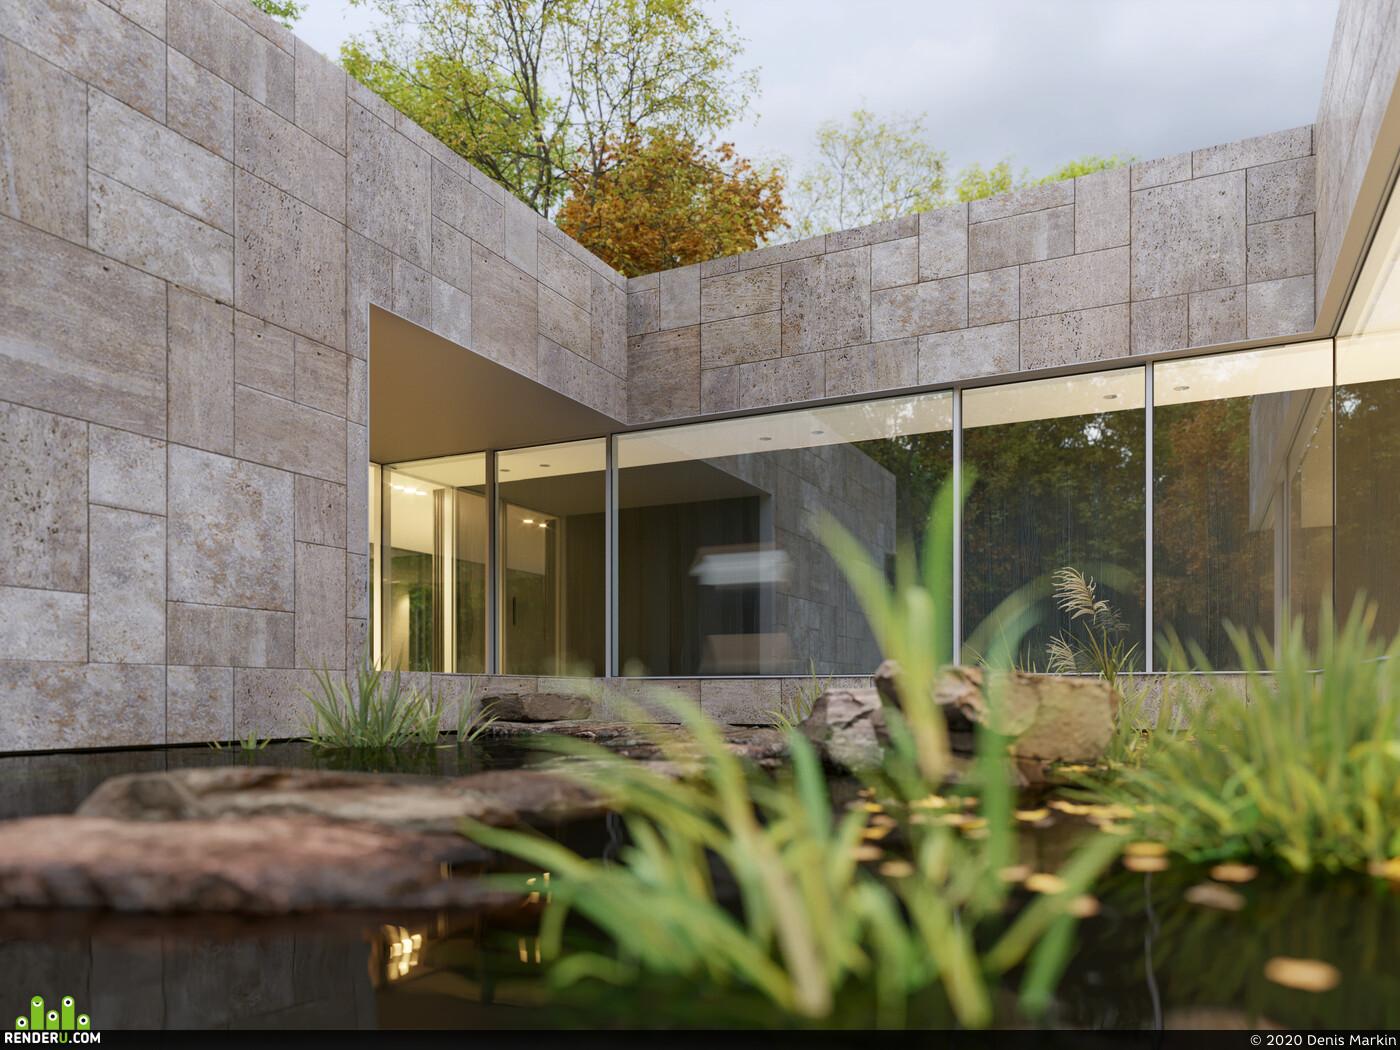 3D Architectural Visualization, 3D Architecture, coronarenderer, Exterior 3d visualization Corona Renderer corona 1.7 coronarenderer